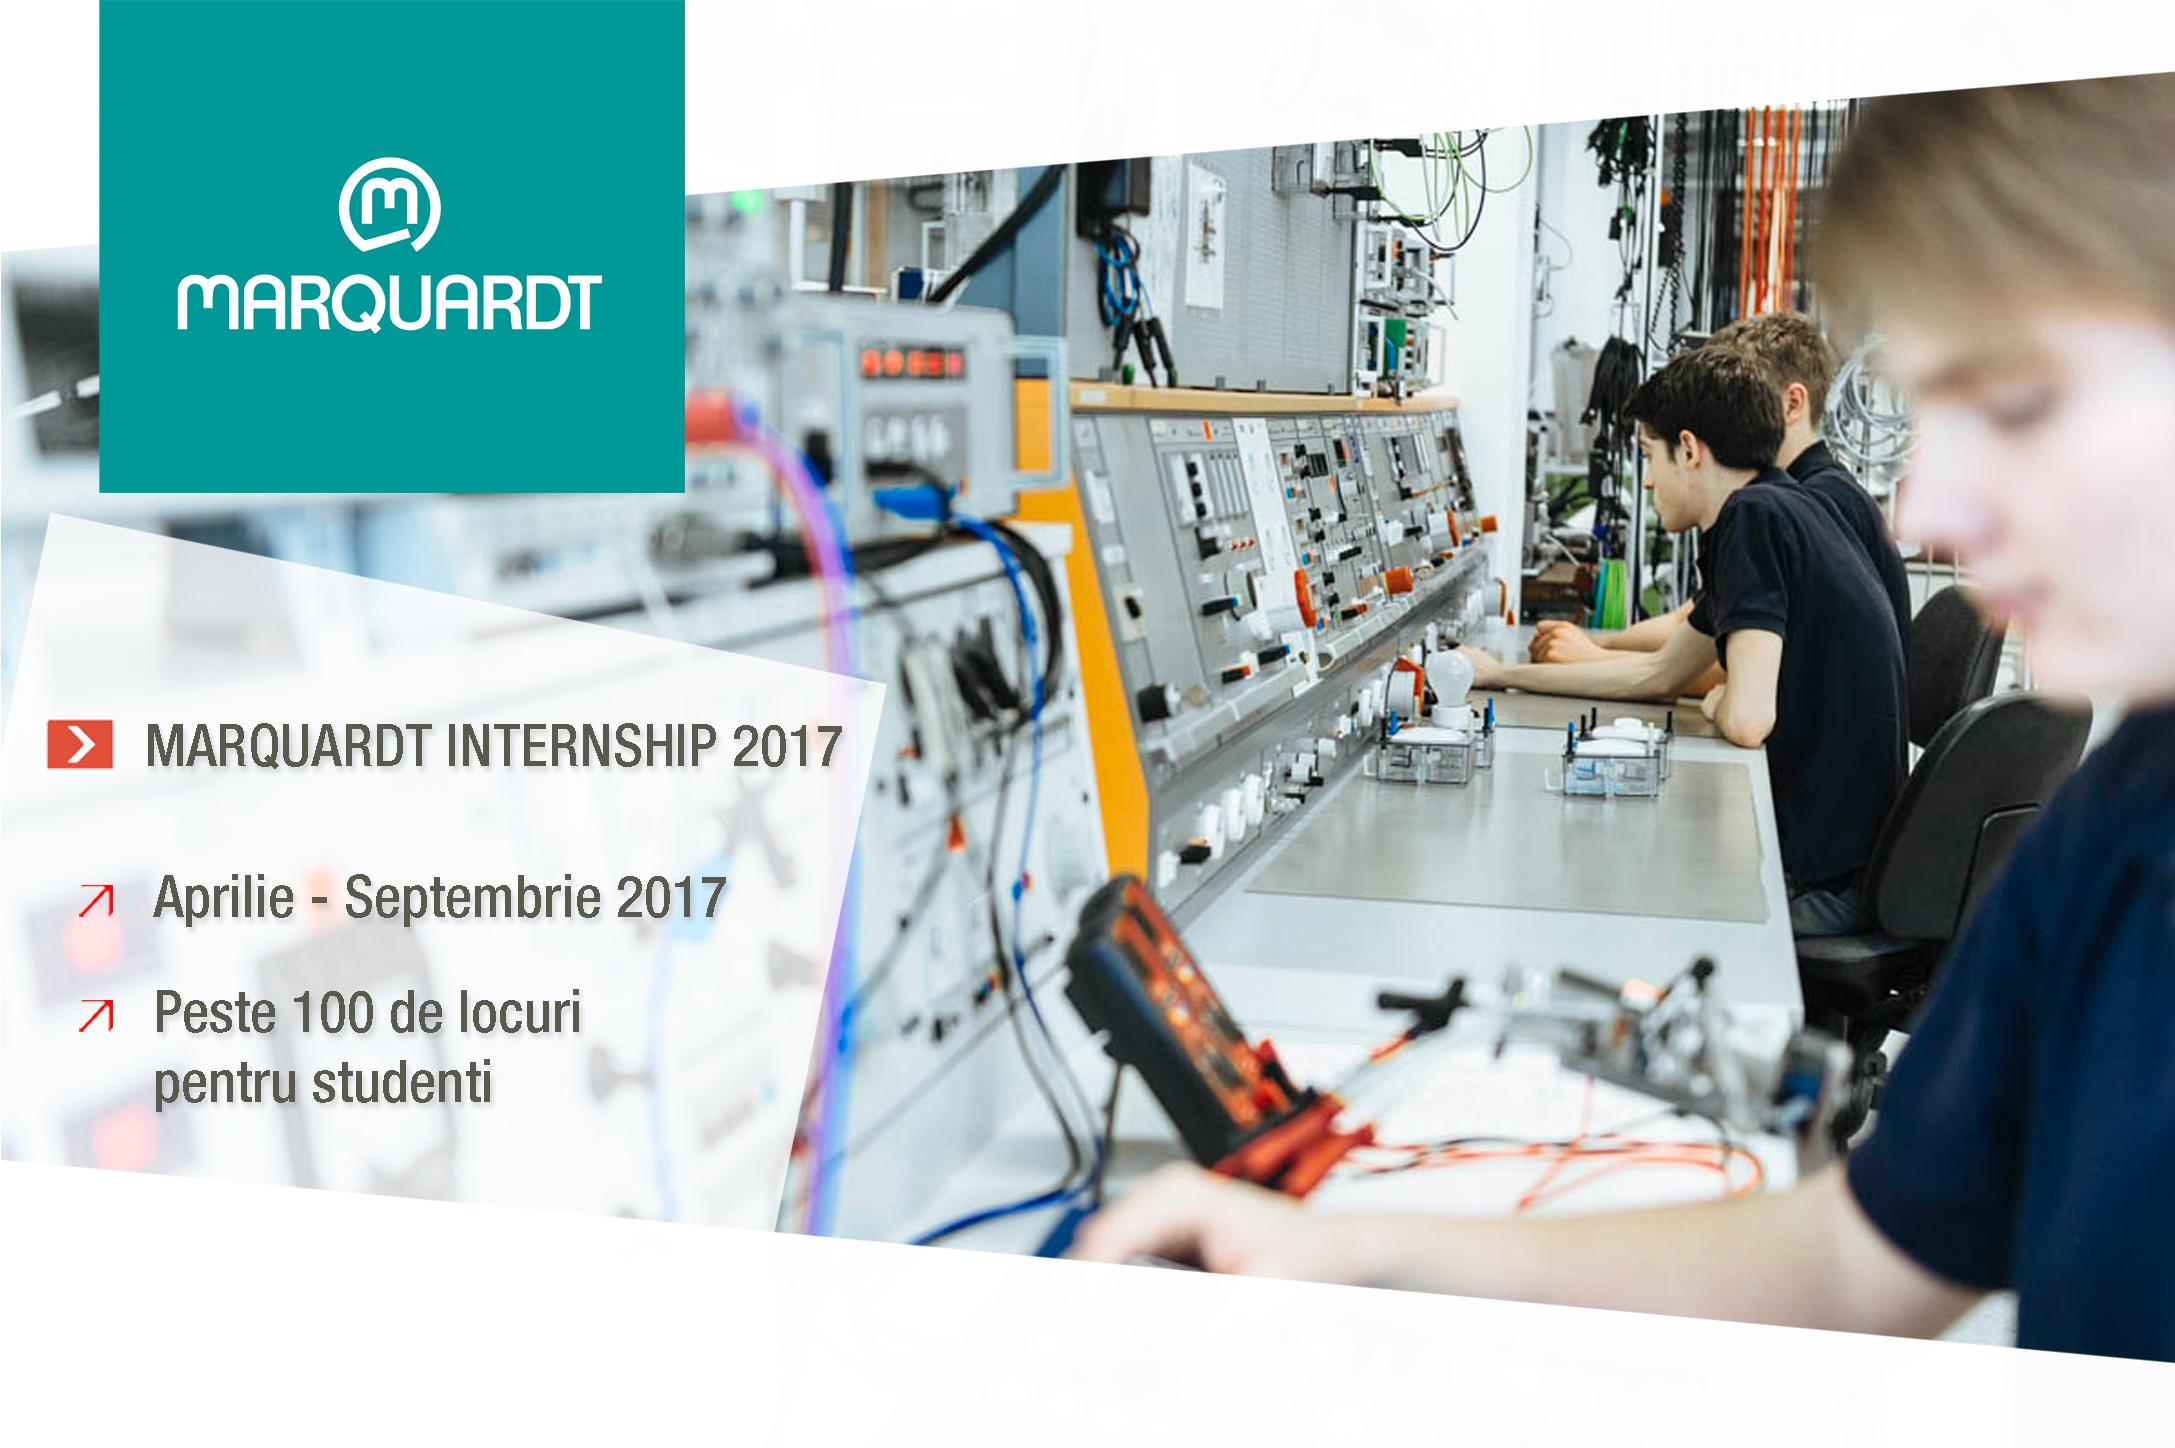 Internship La Marquardt 2017